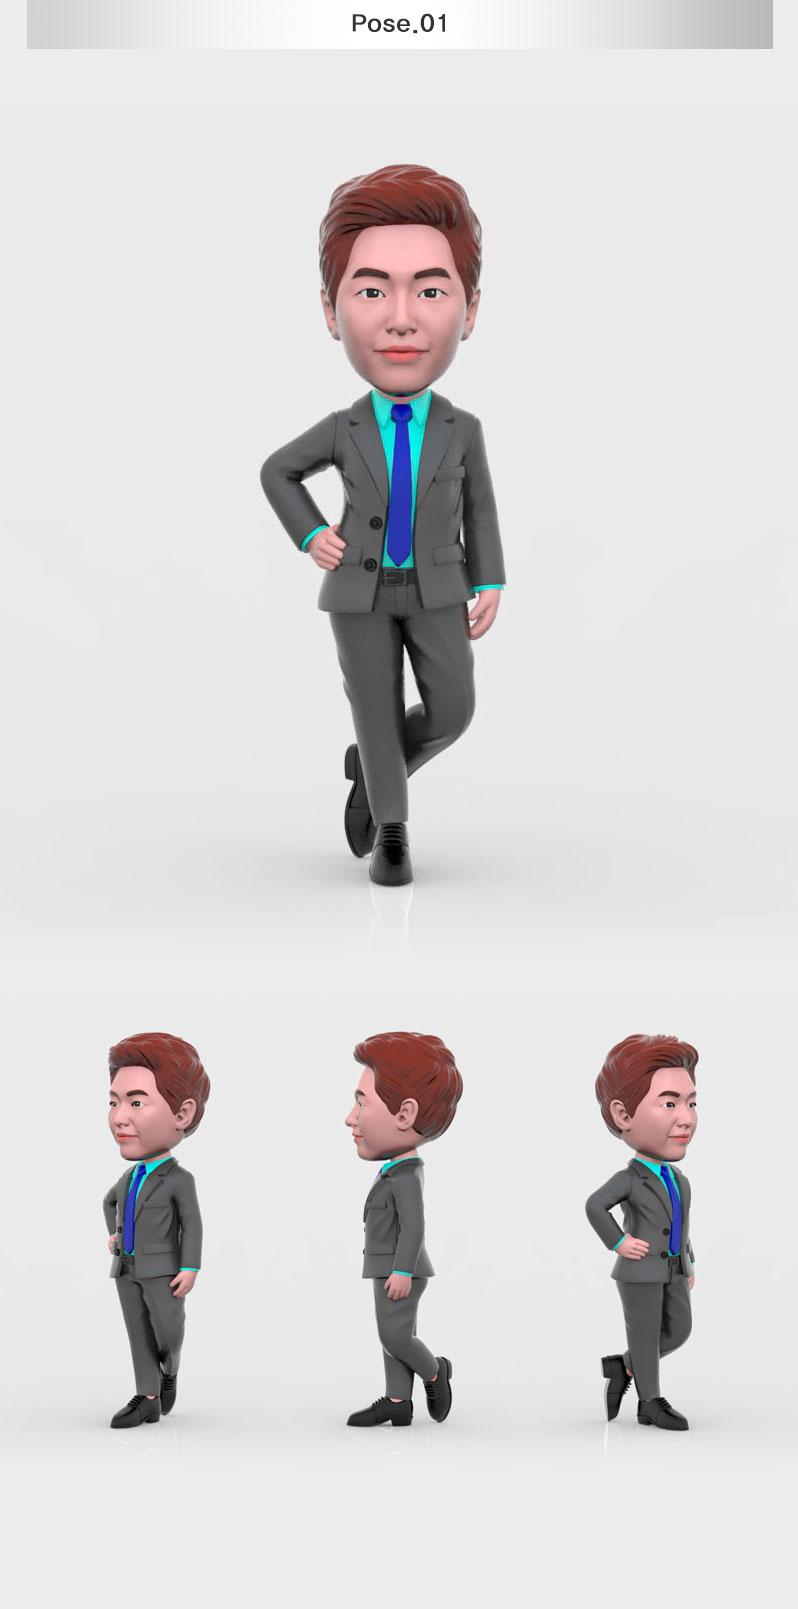 suit_pose01